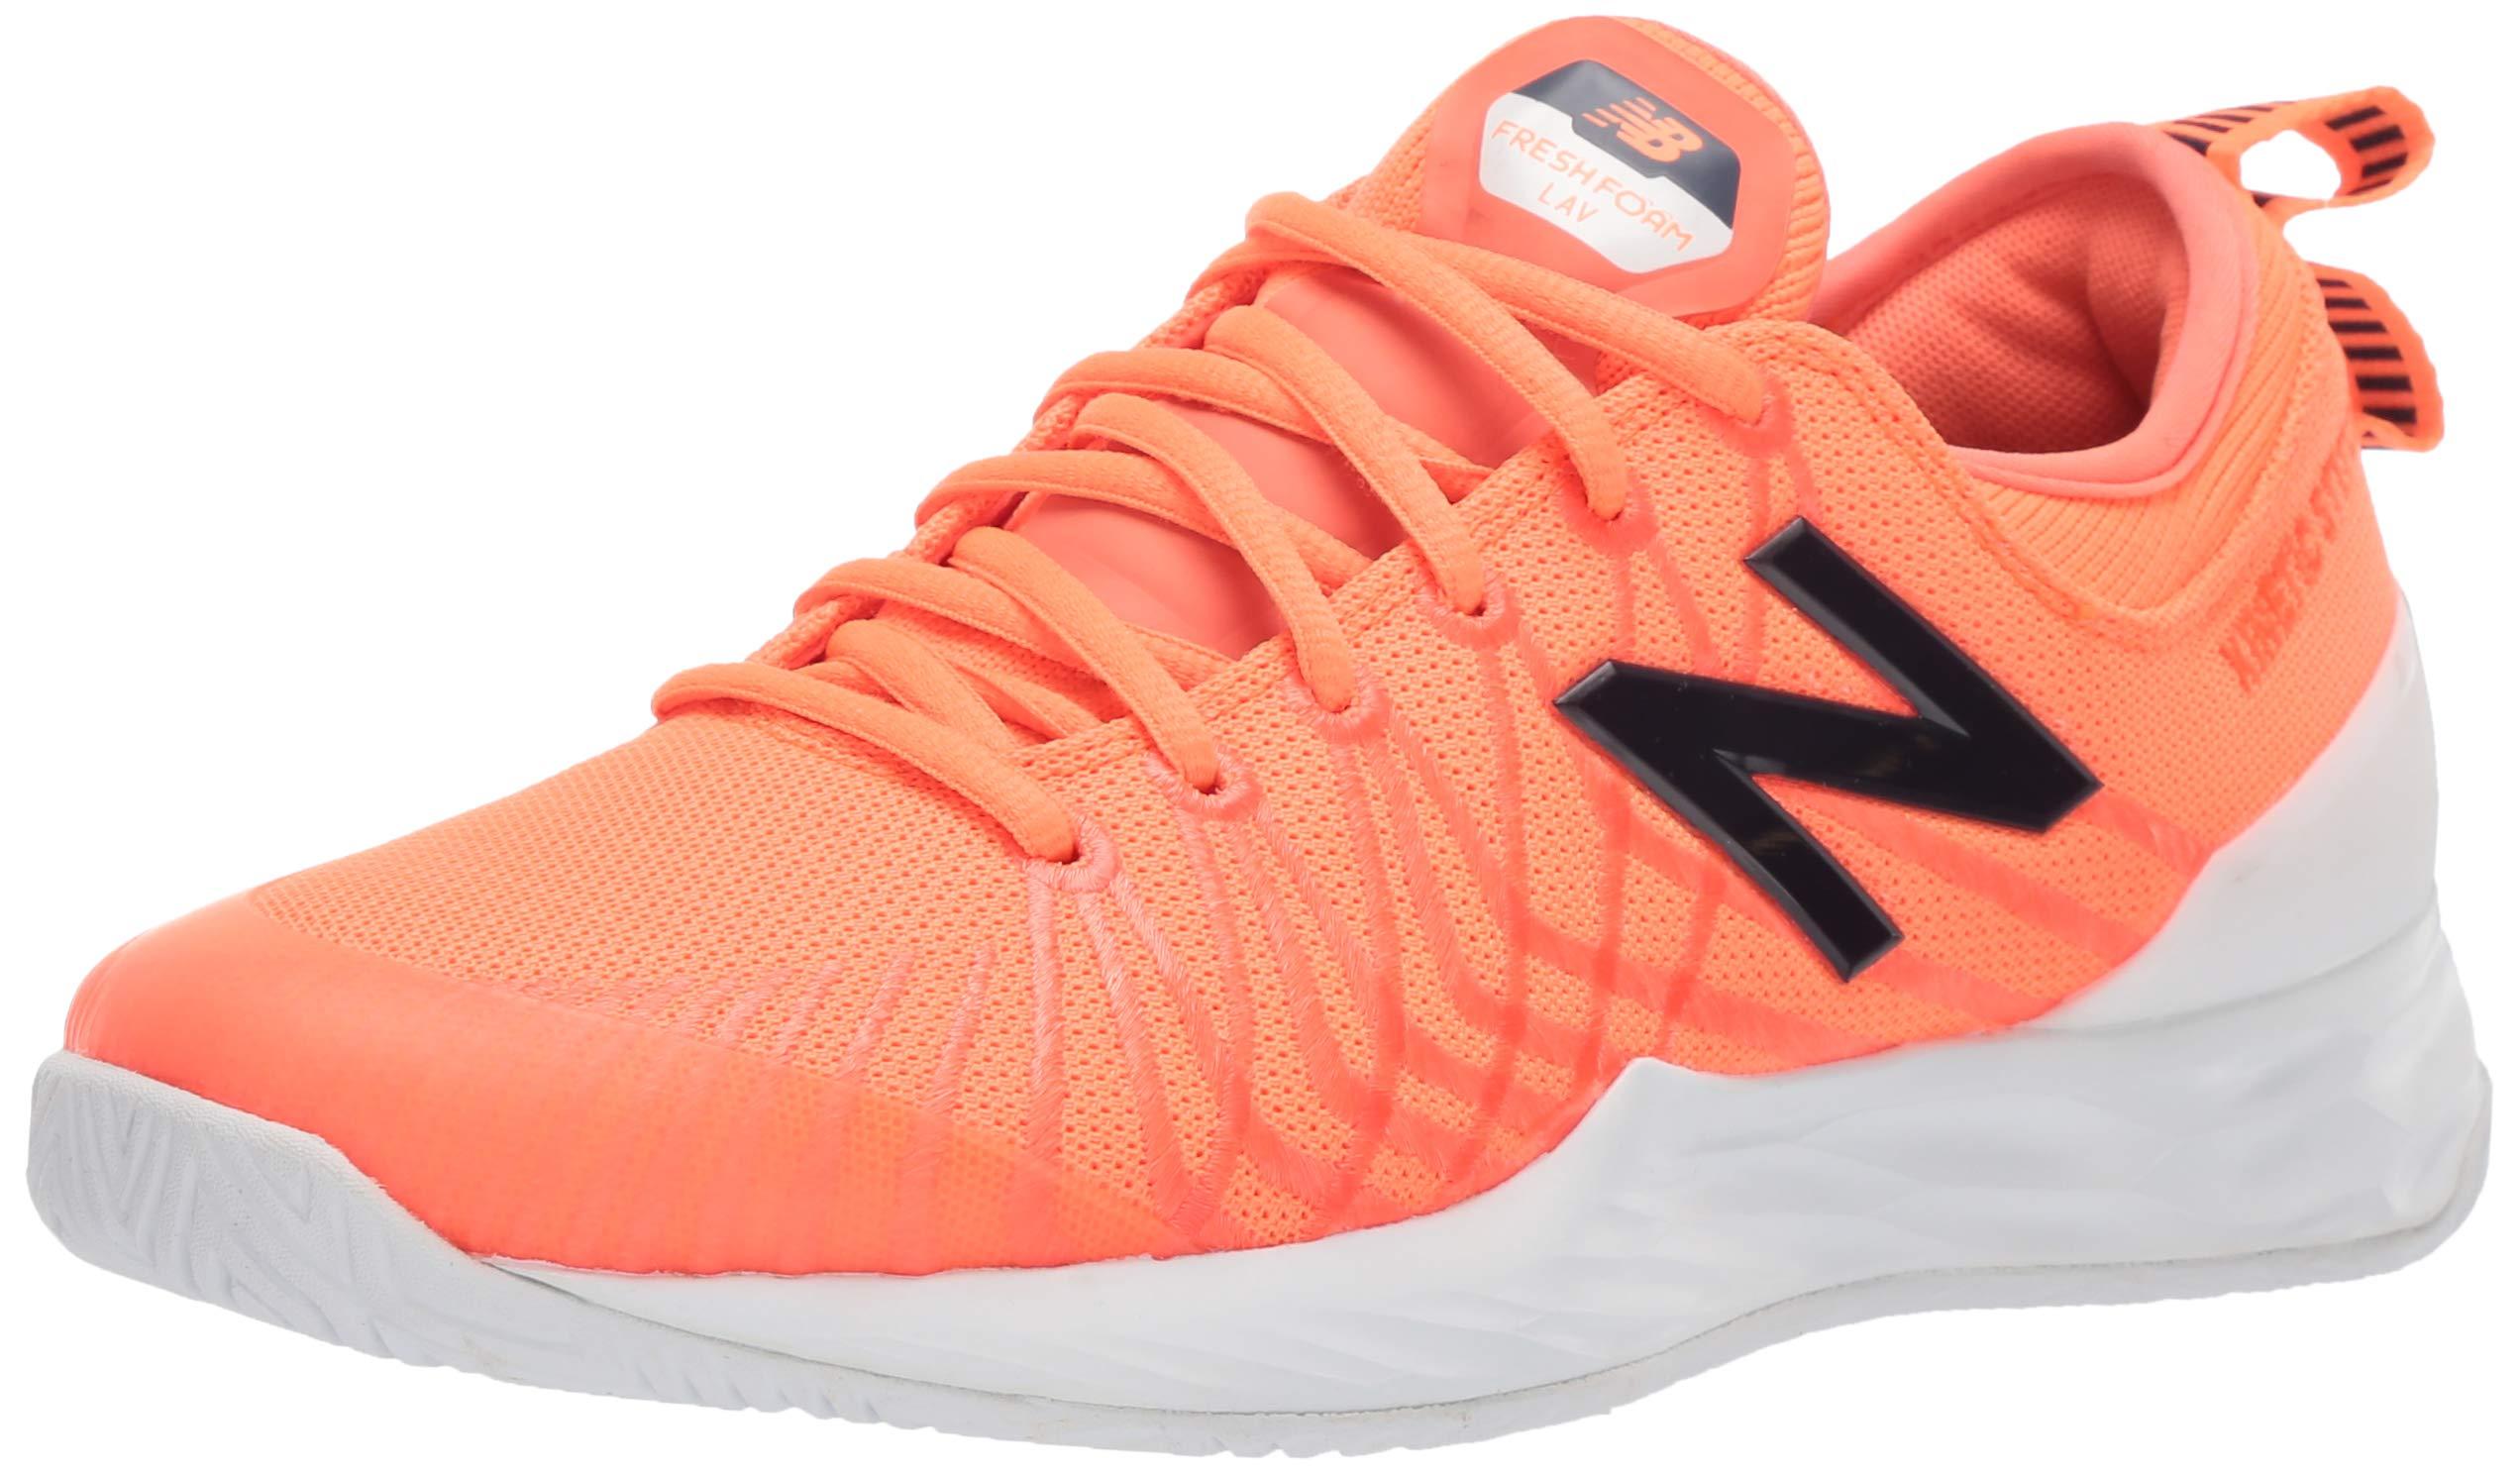 New Balance Men's LAV V1 Hard Court Tennis Shoe, Dark Mango/Cyclone, 5 D US